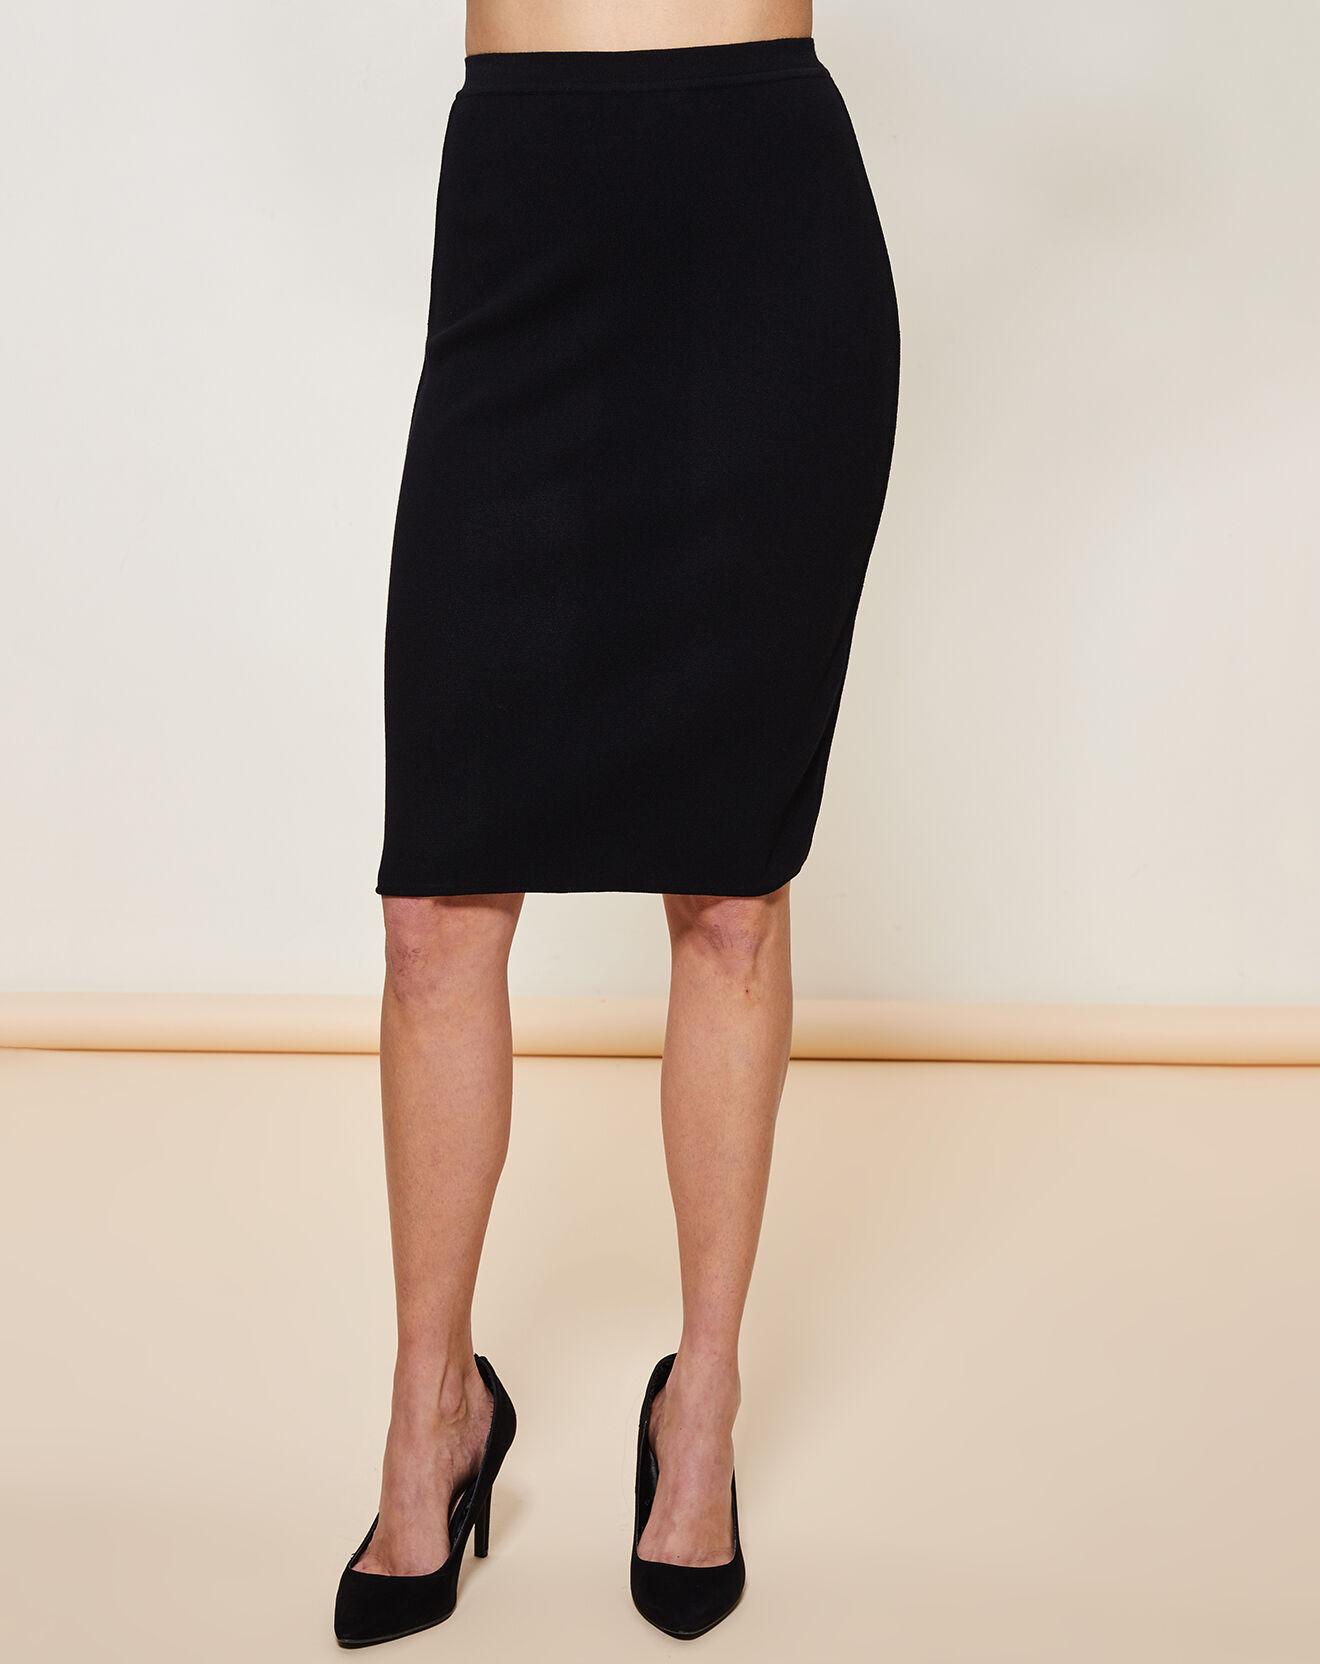 Jupe droite côtelée noire - Giorgio Armani - Modalova